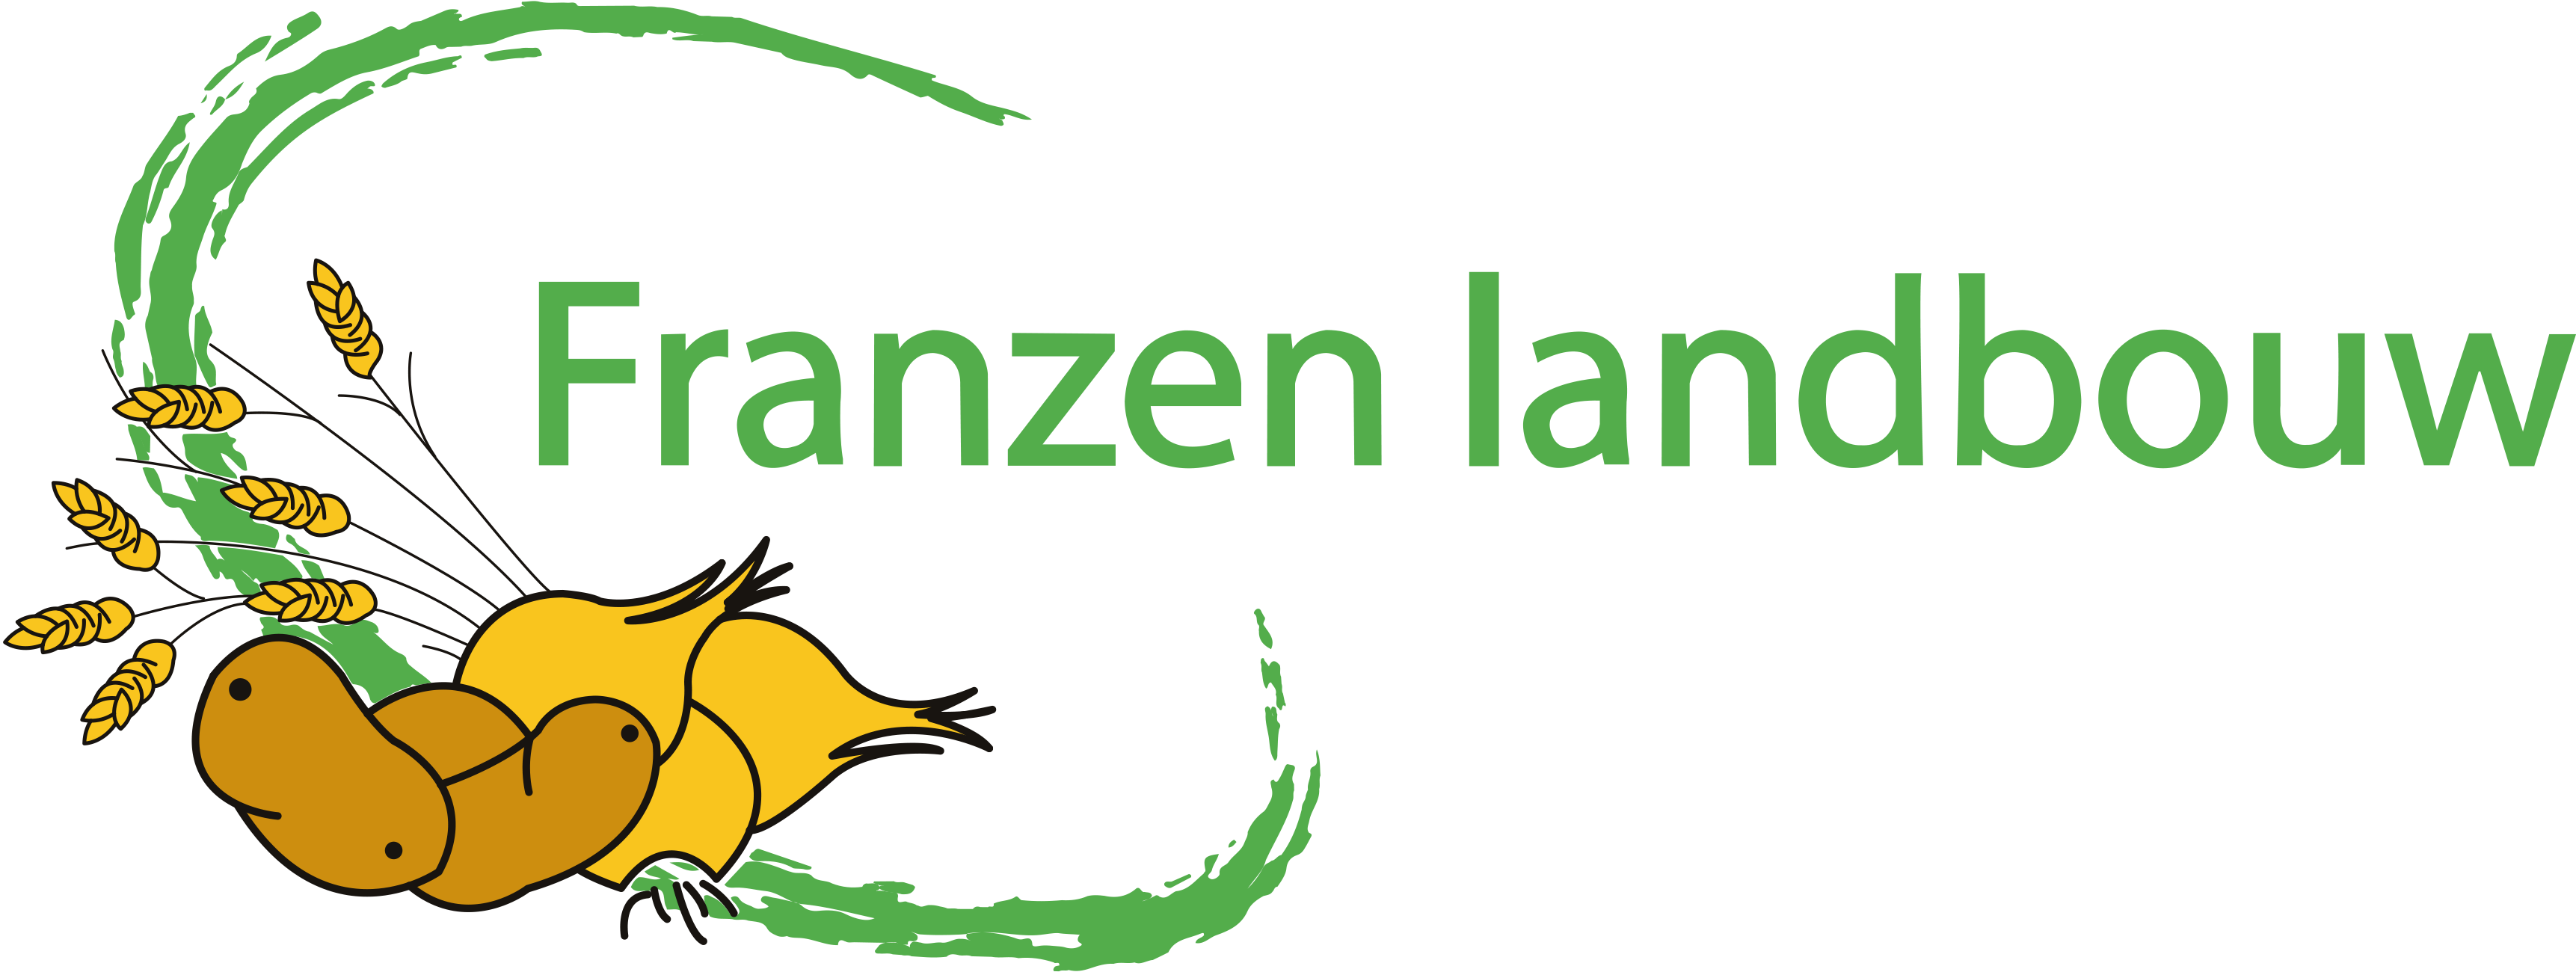 Franzen Landbouw